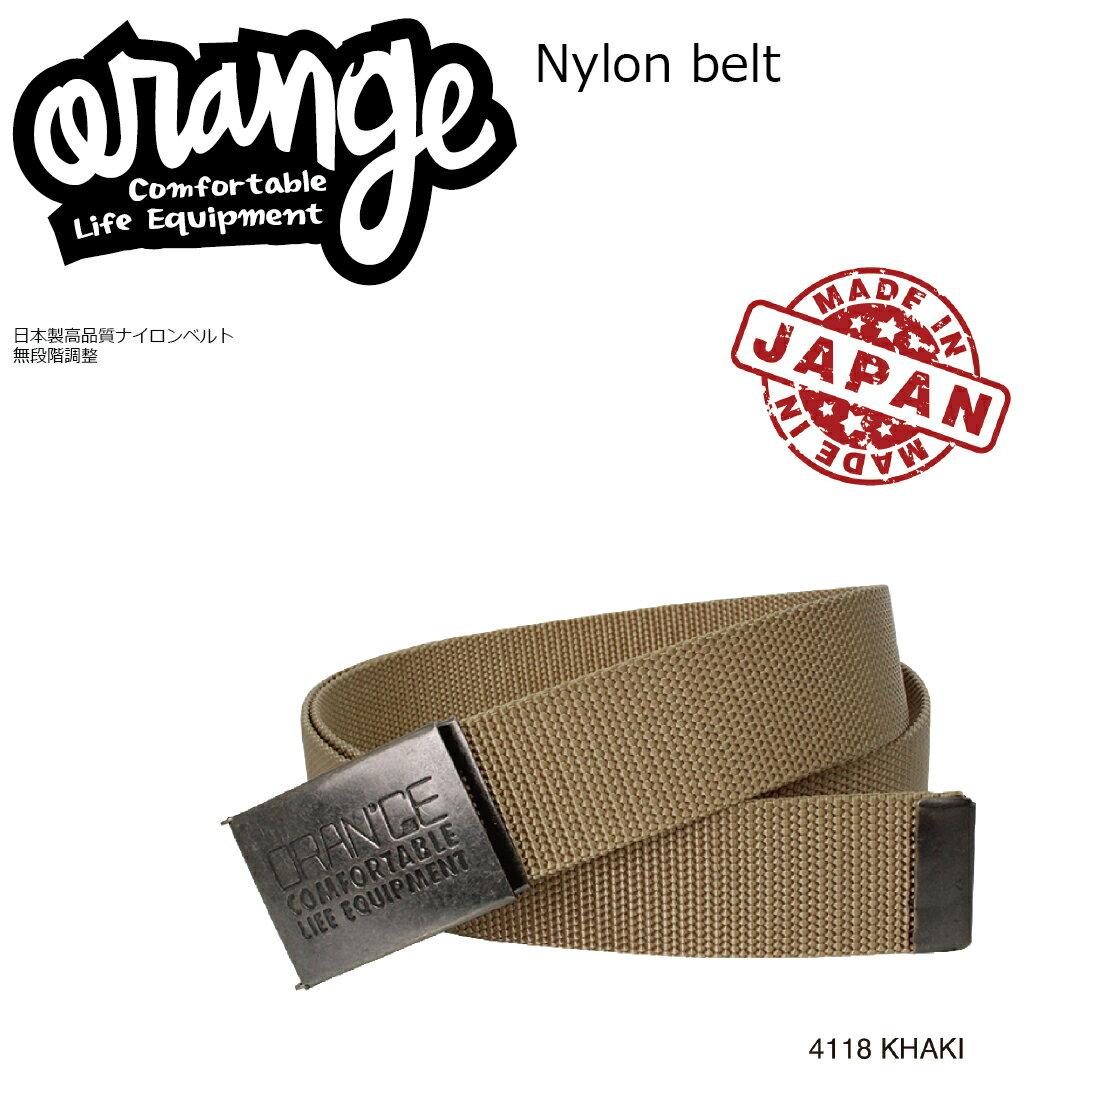 Oran'ge Nylon belt 4118 KHAKI ガチャベルト ナイロンベルト 2017 2017-18